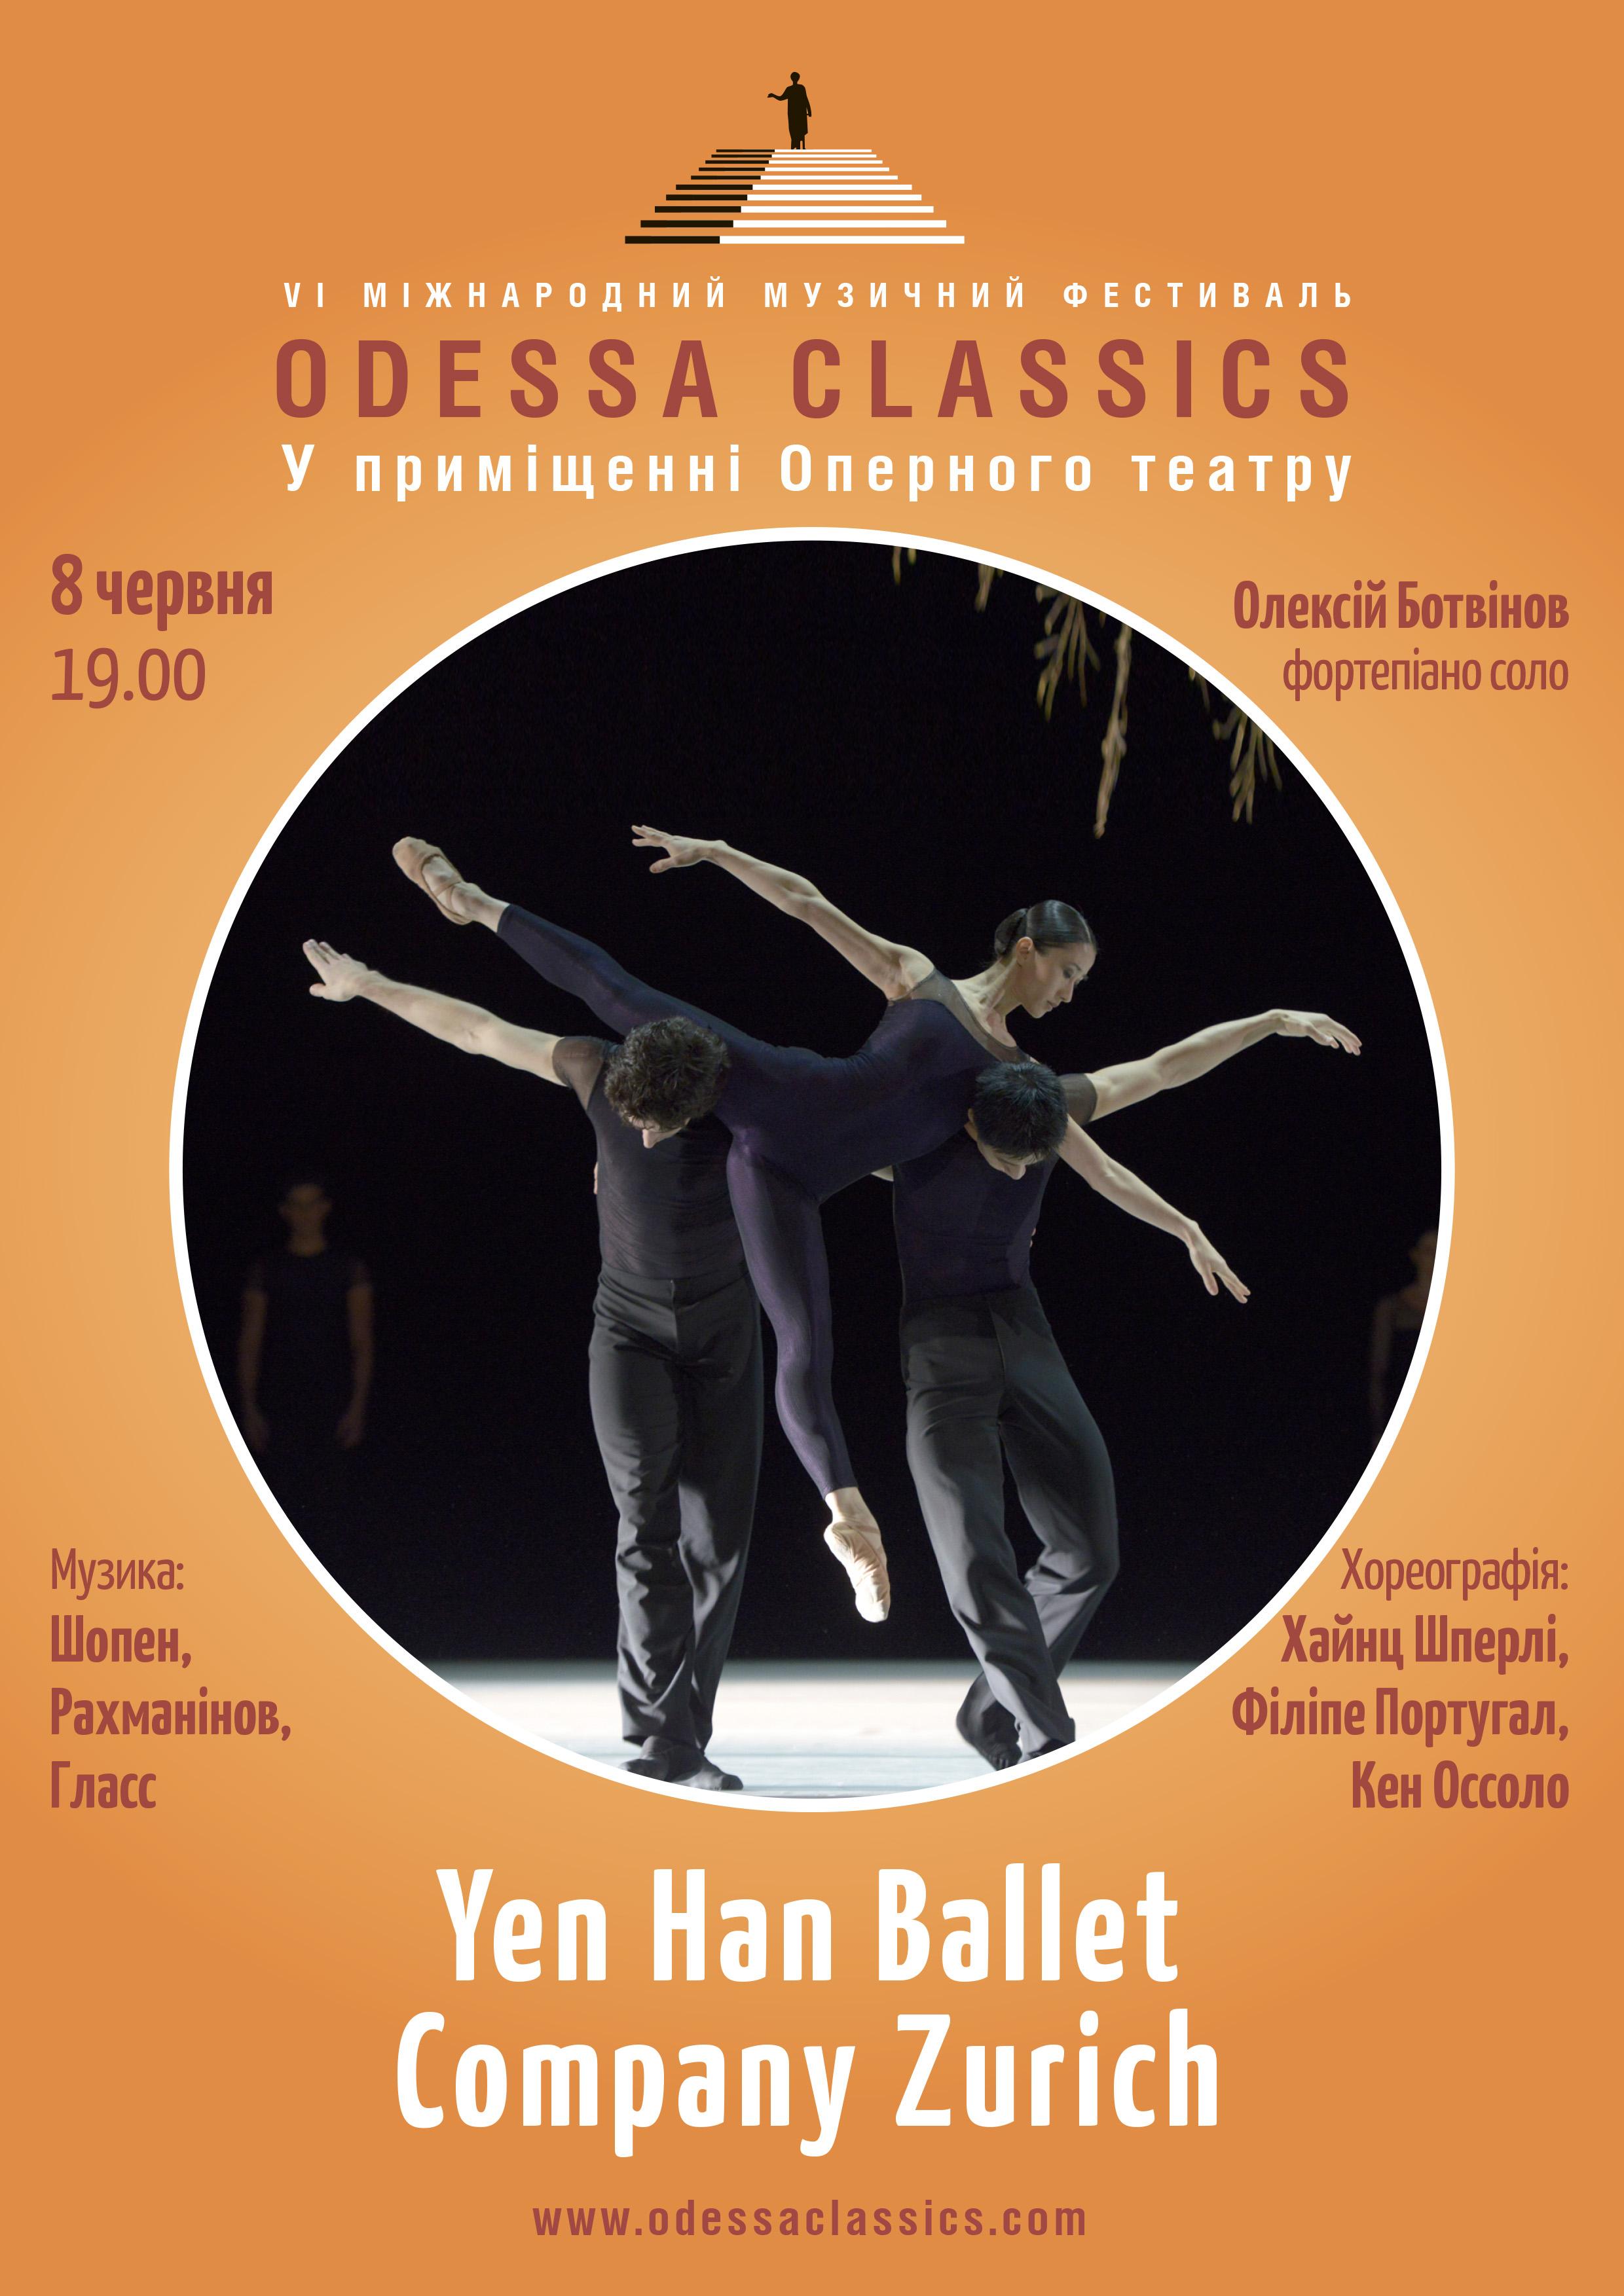 Odessa Classic: Yen Han Ballet Company Zurich